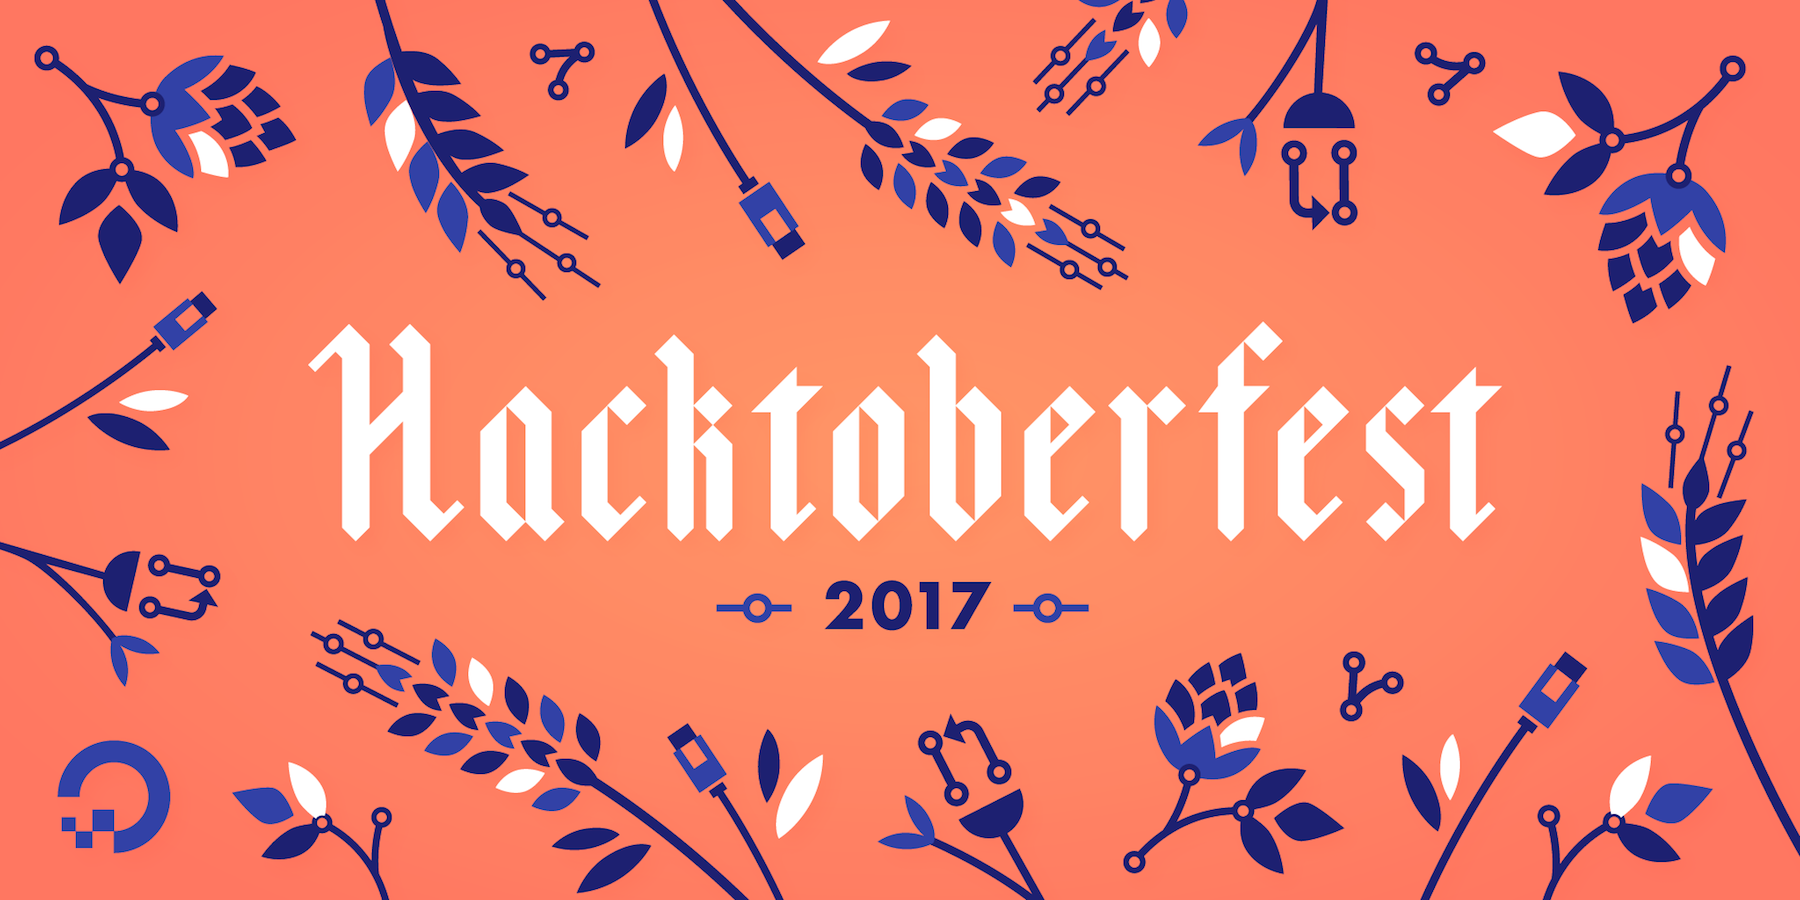 Hacktoberfest Open Hack Day в Avito — 7 октября - 1